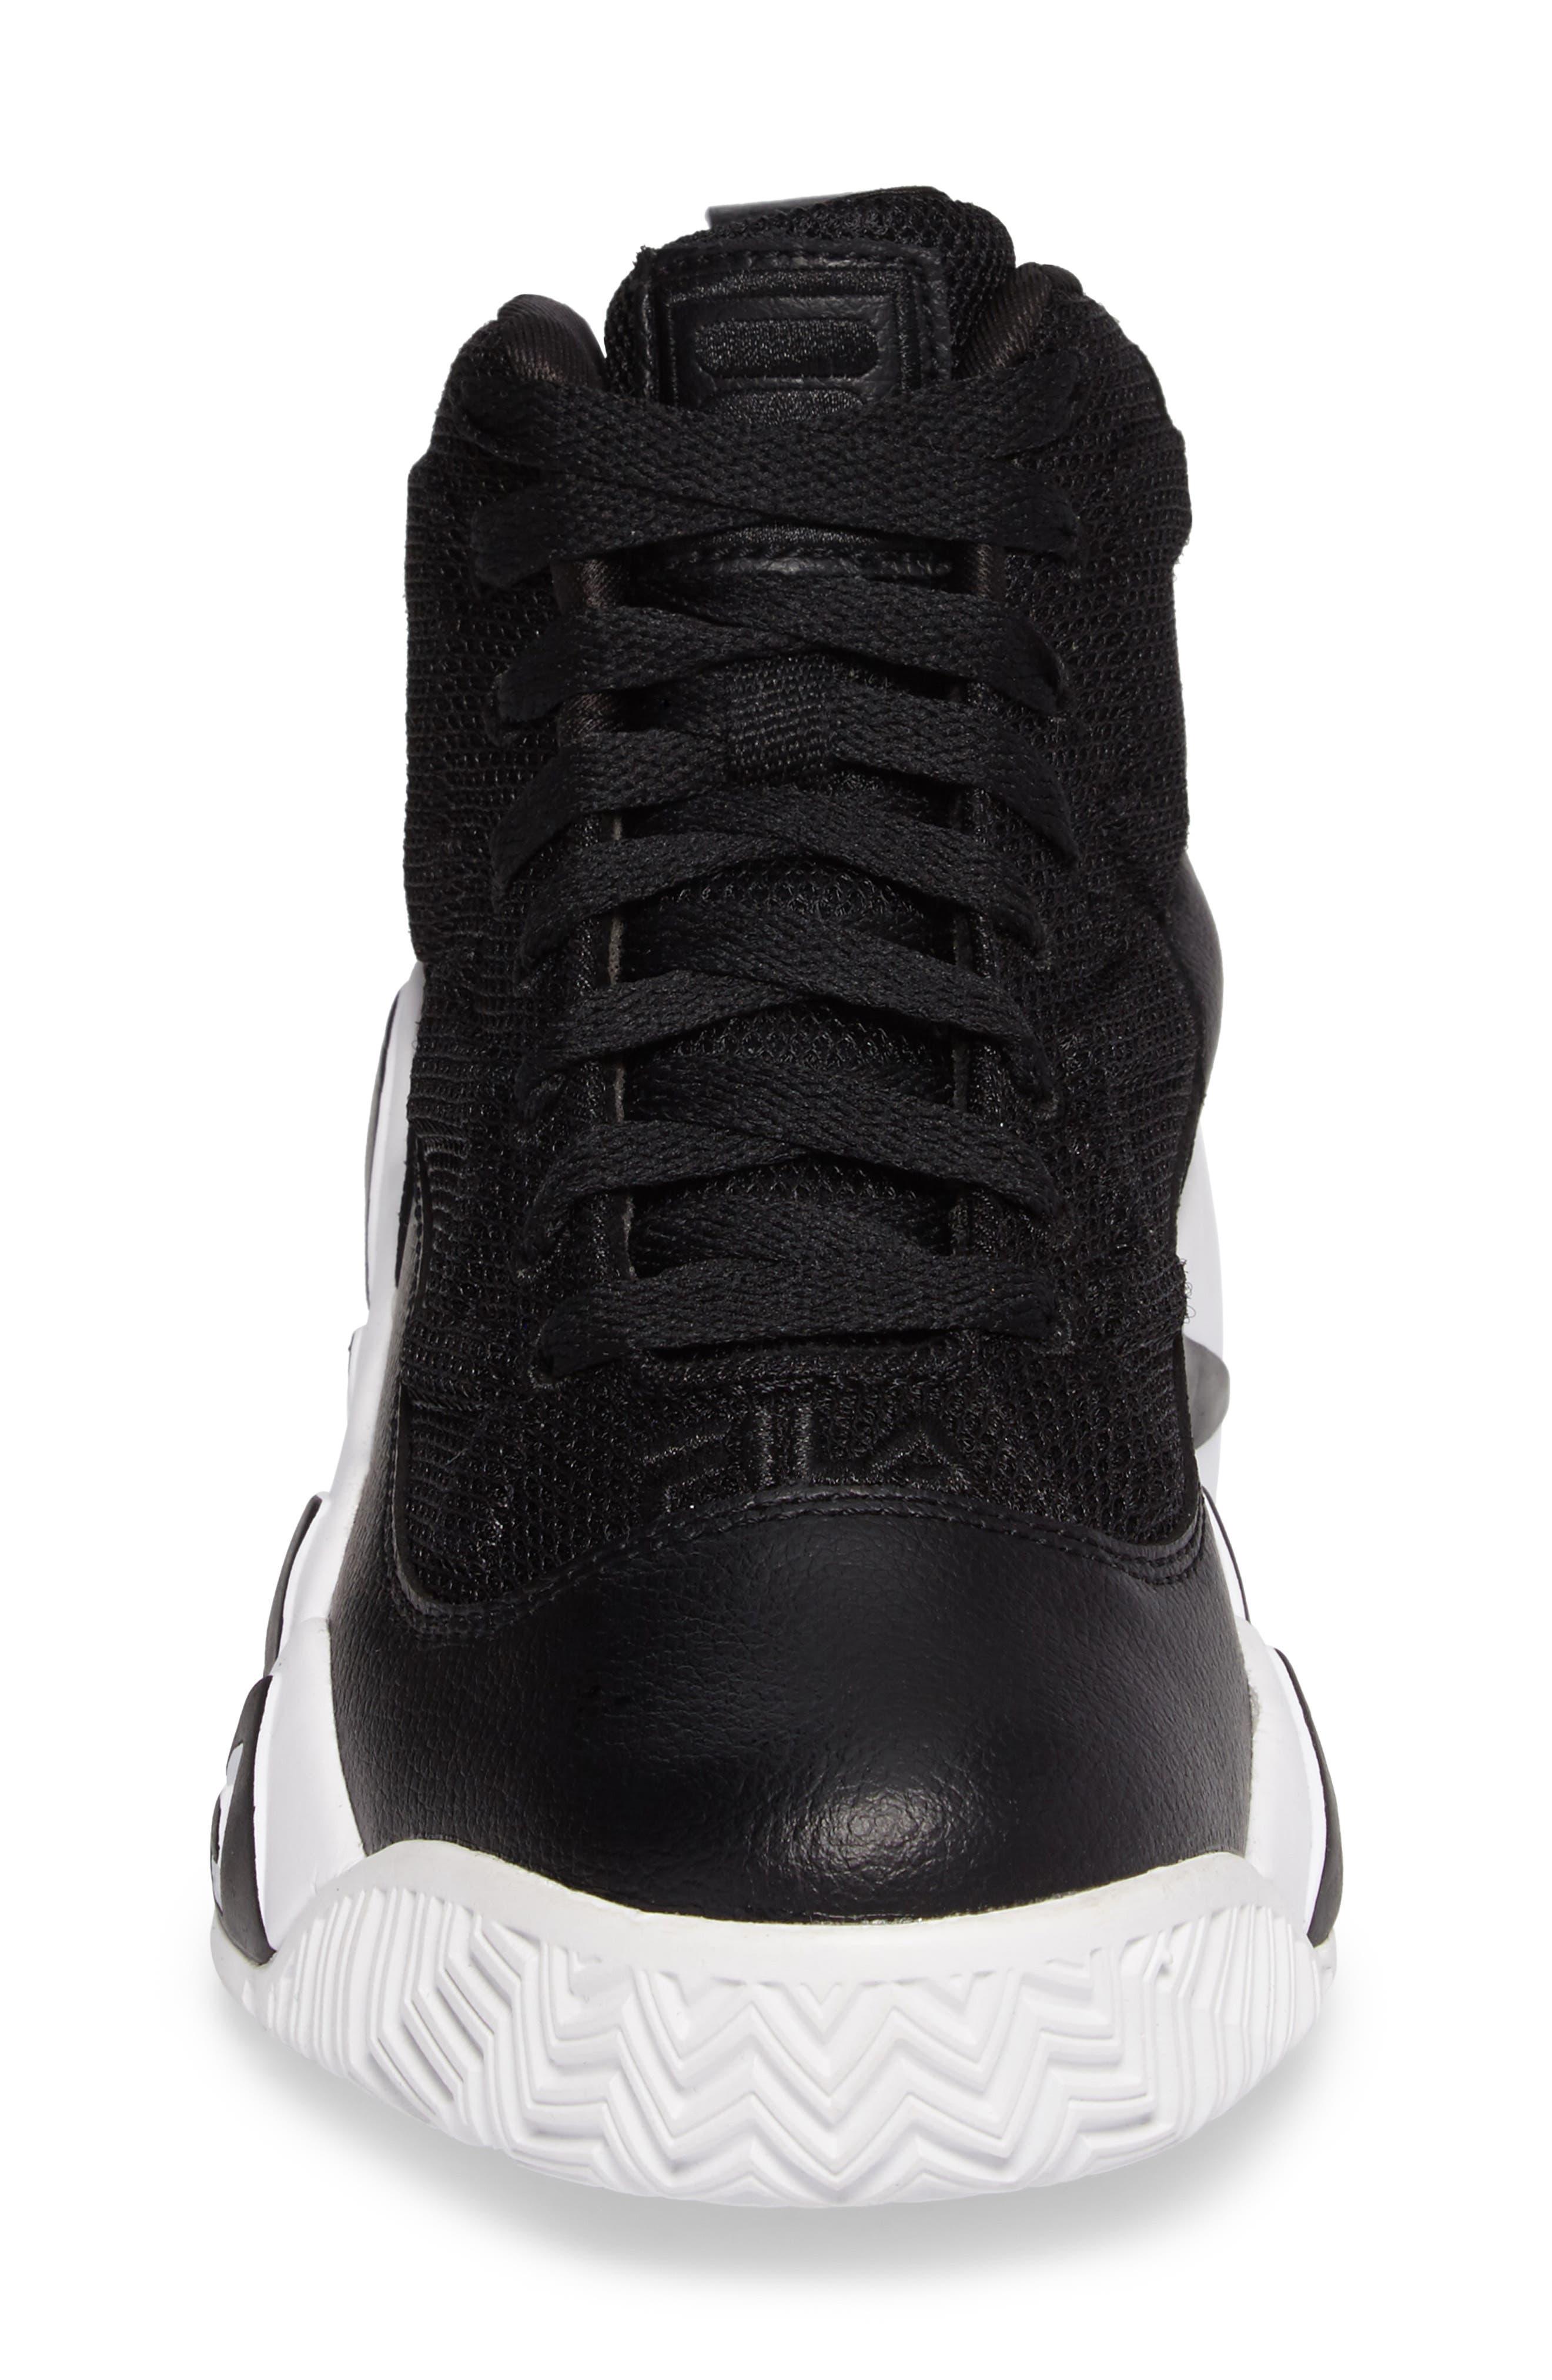 MB Mesh Sneaker,                             Alternate thumbnail 4, color,                             016